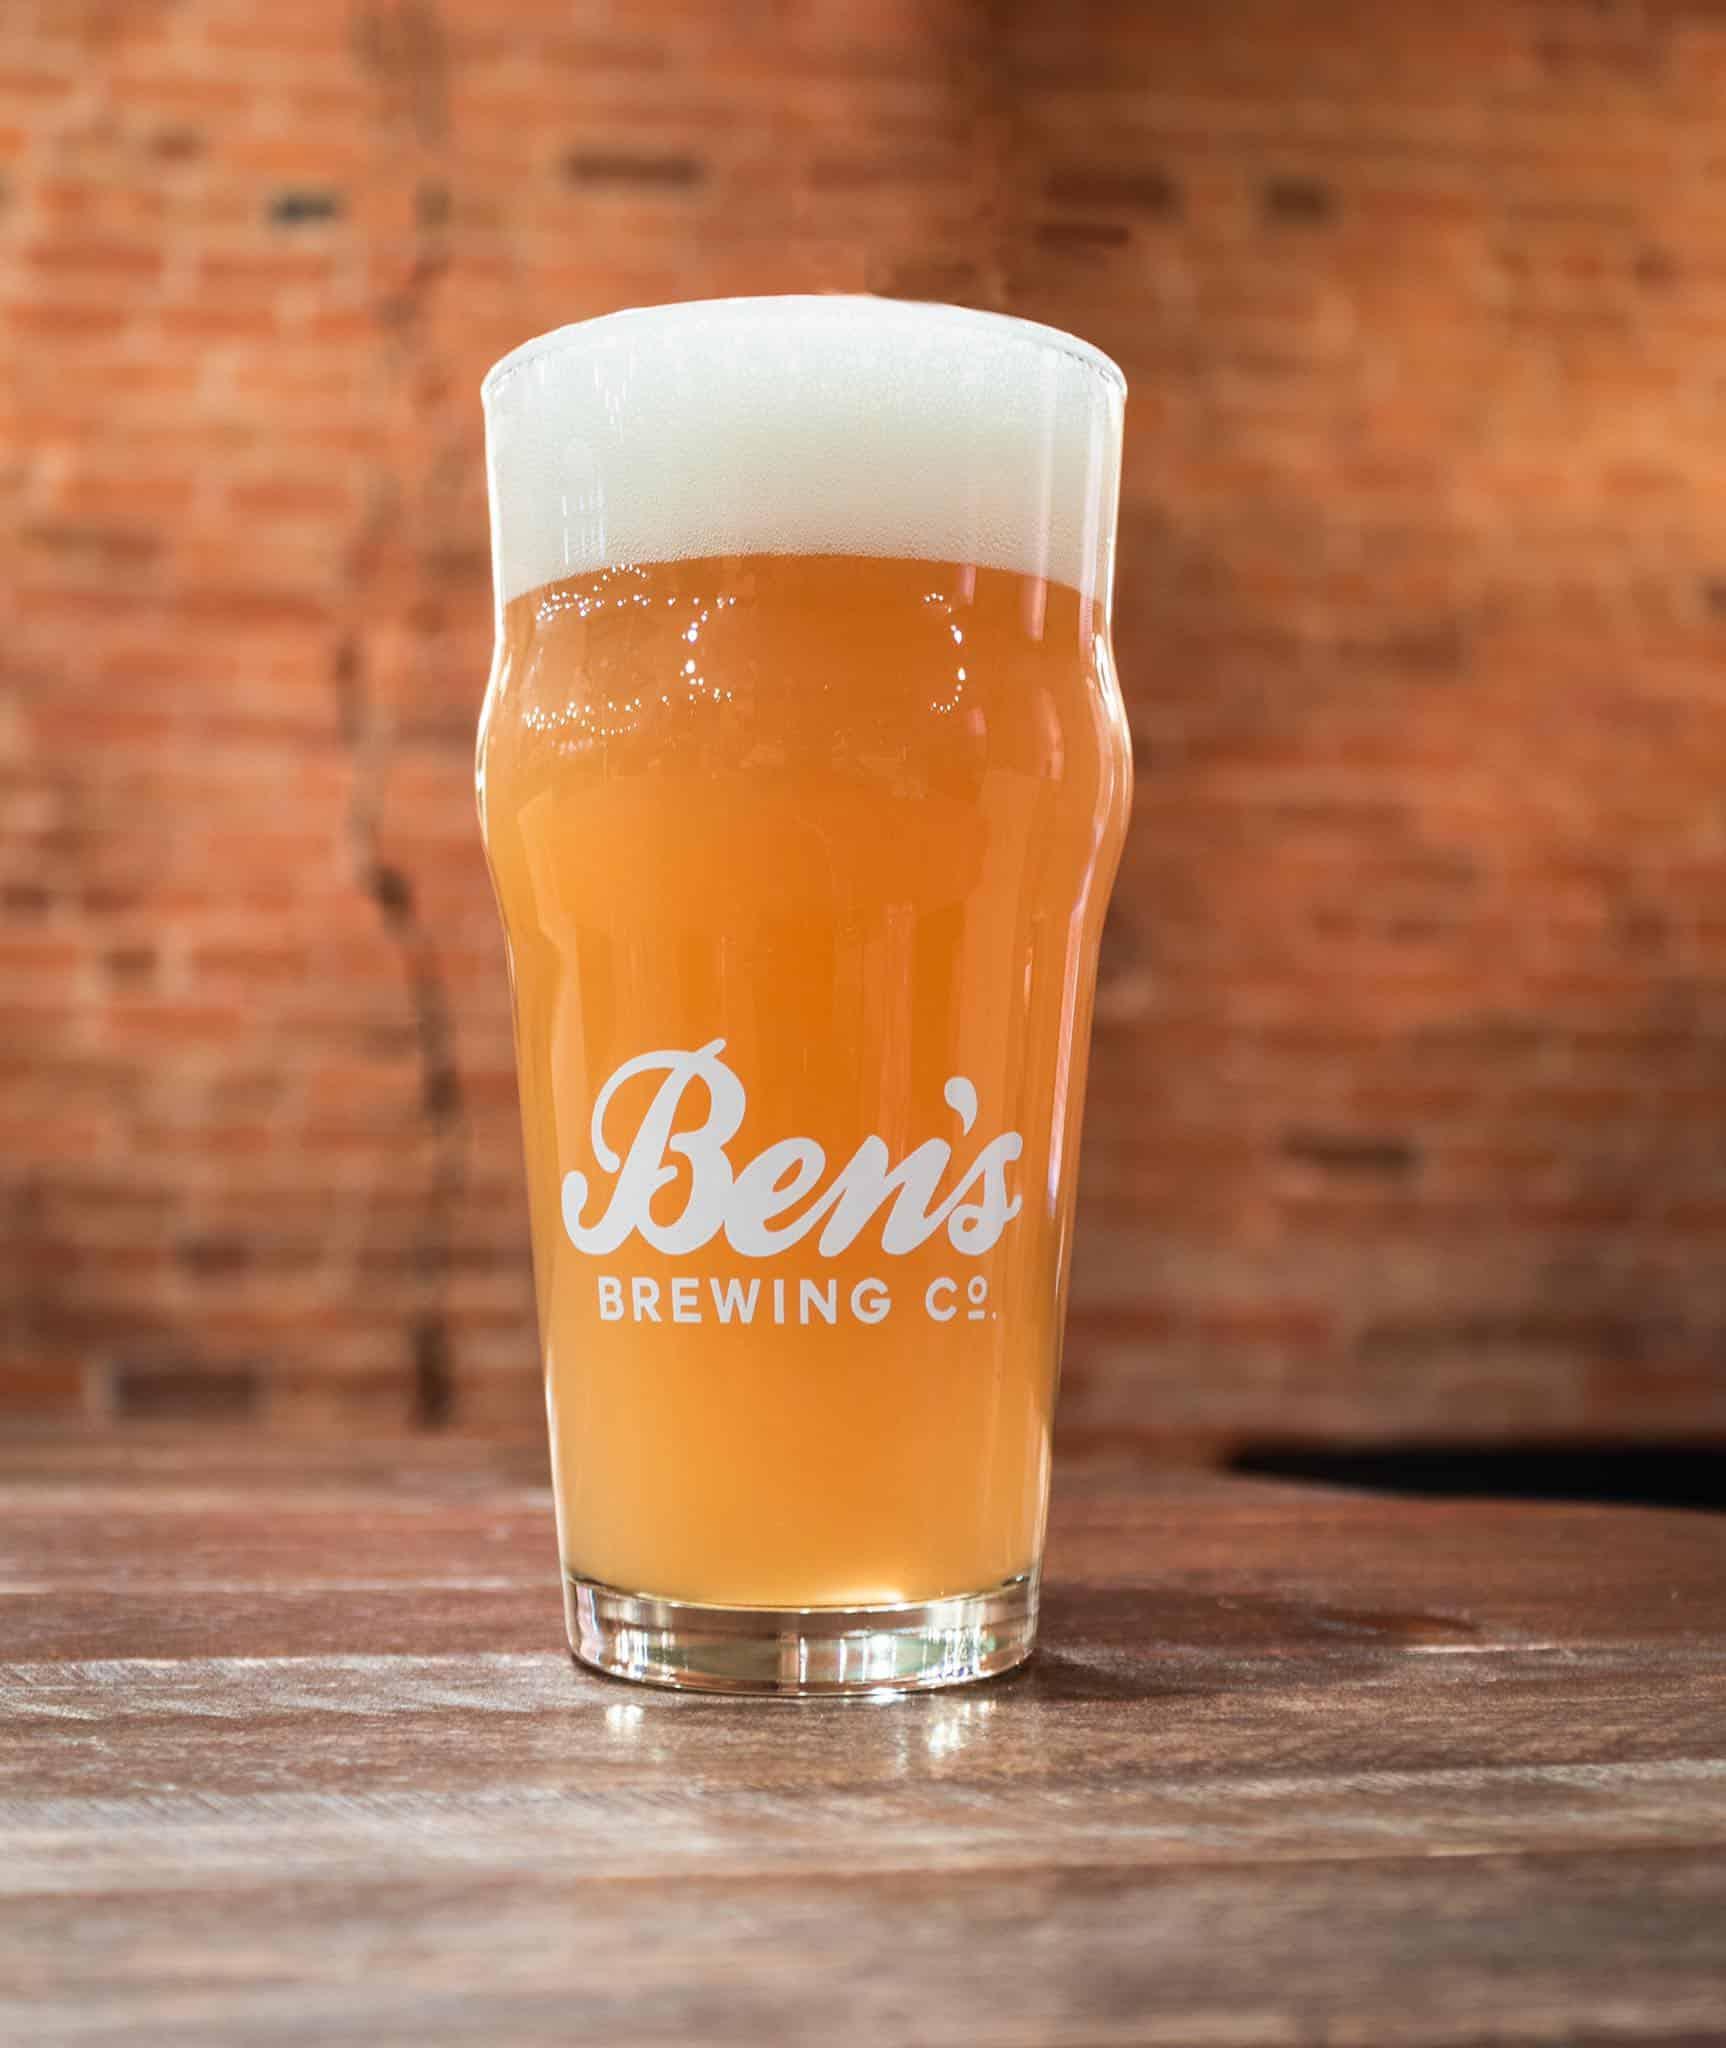 Ben's Brewing Co.